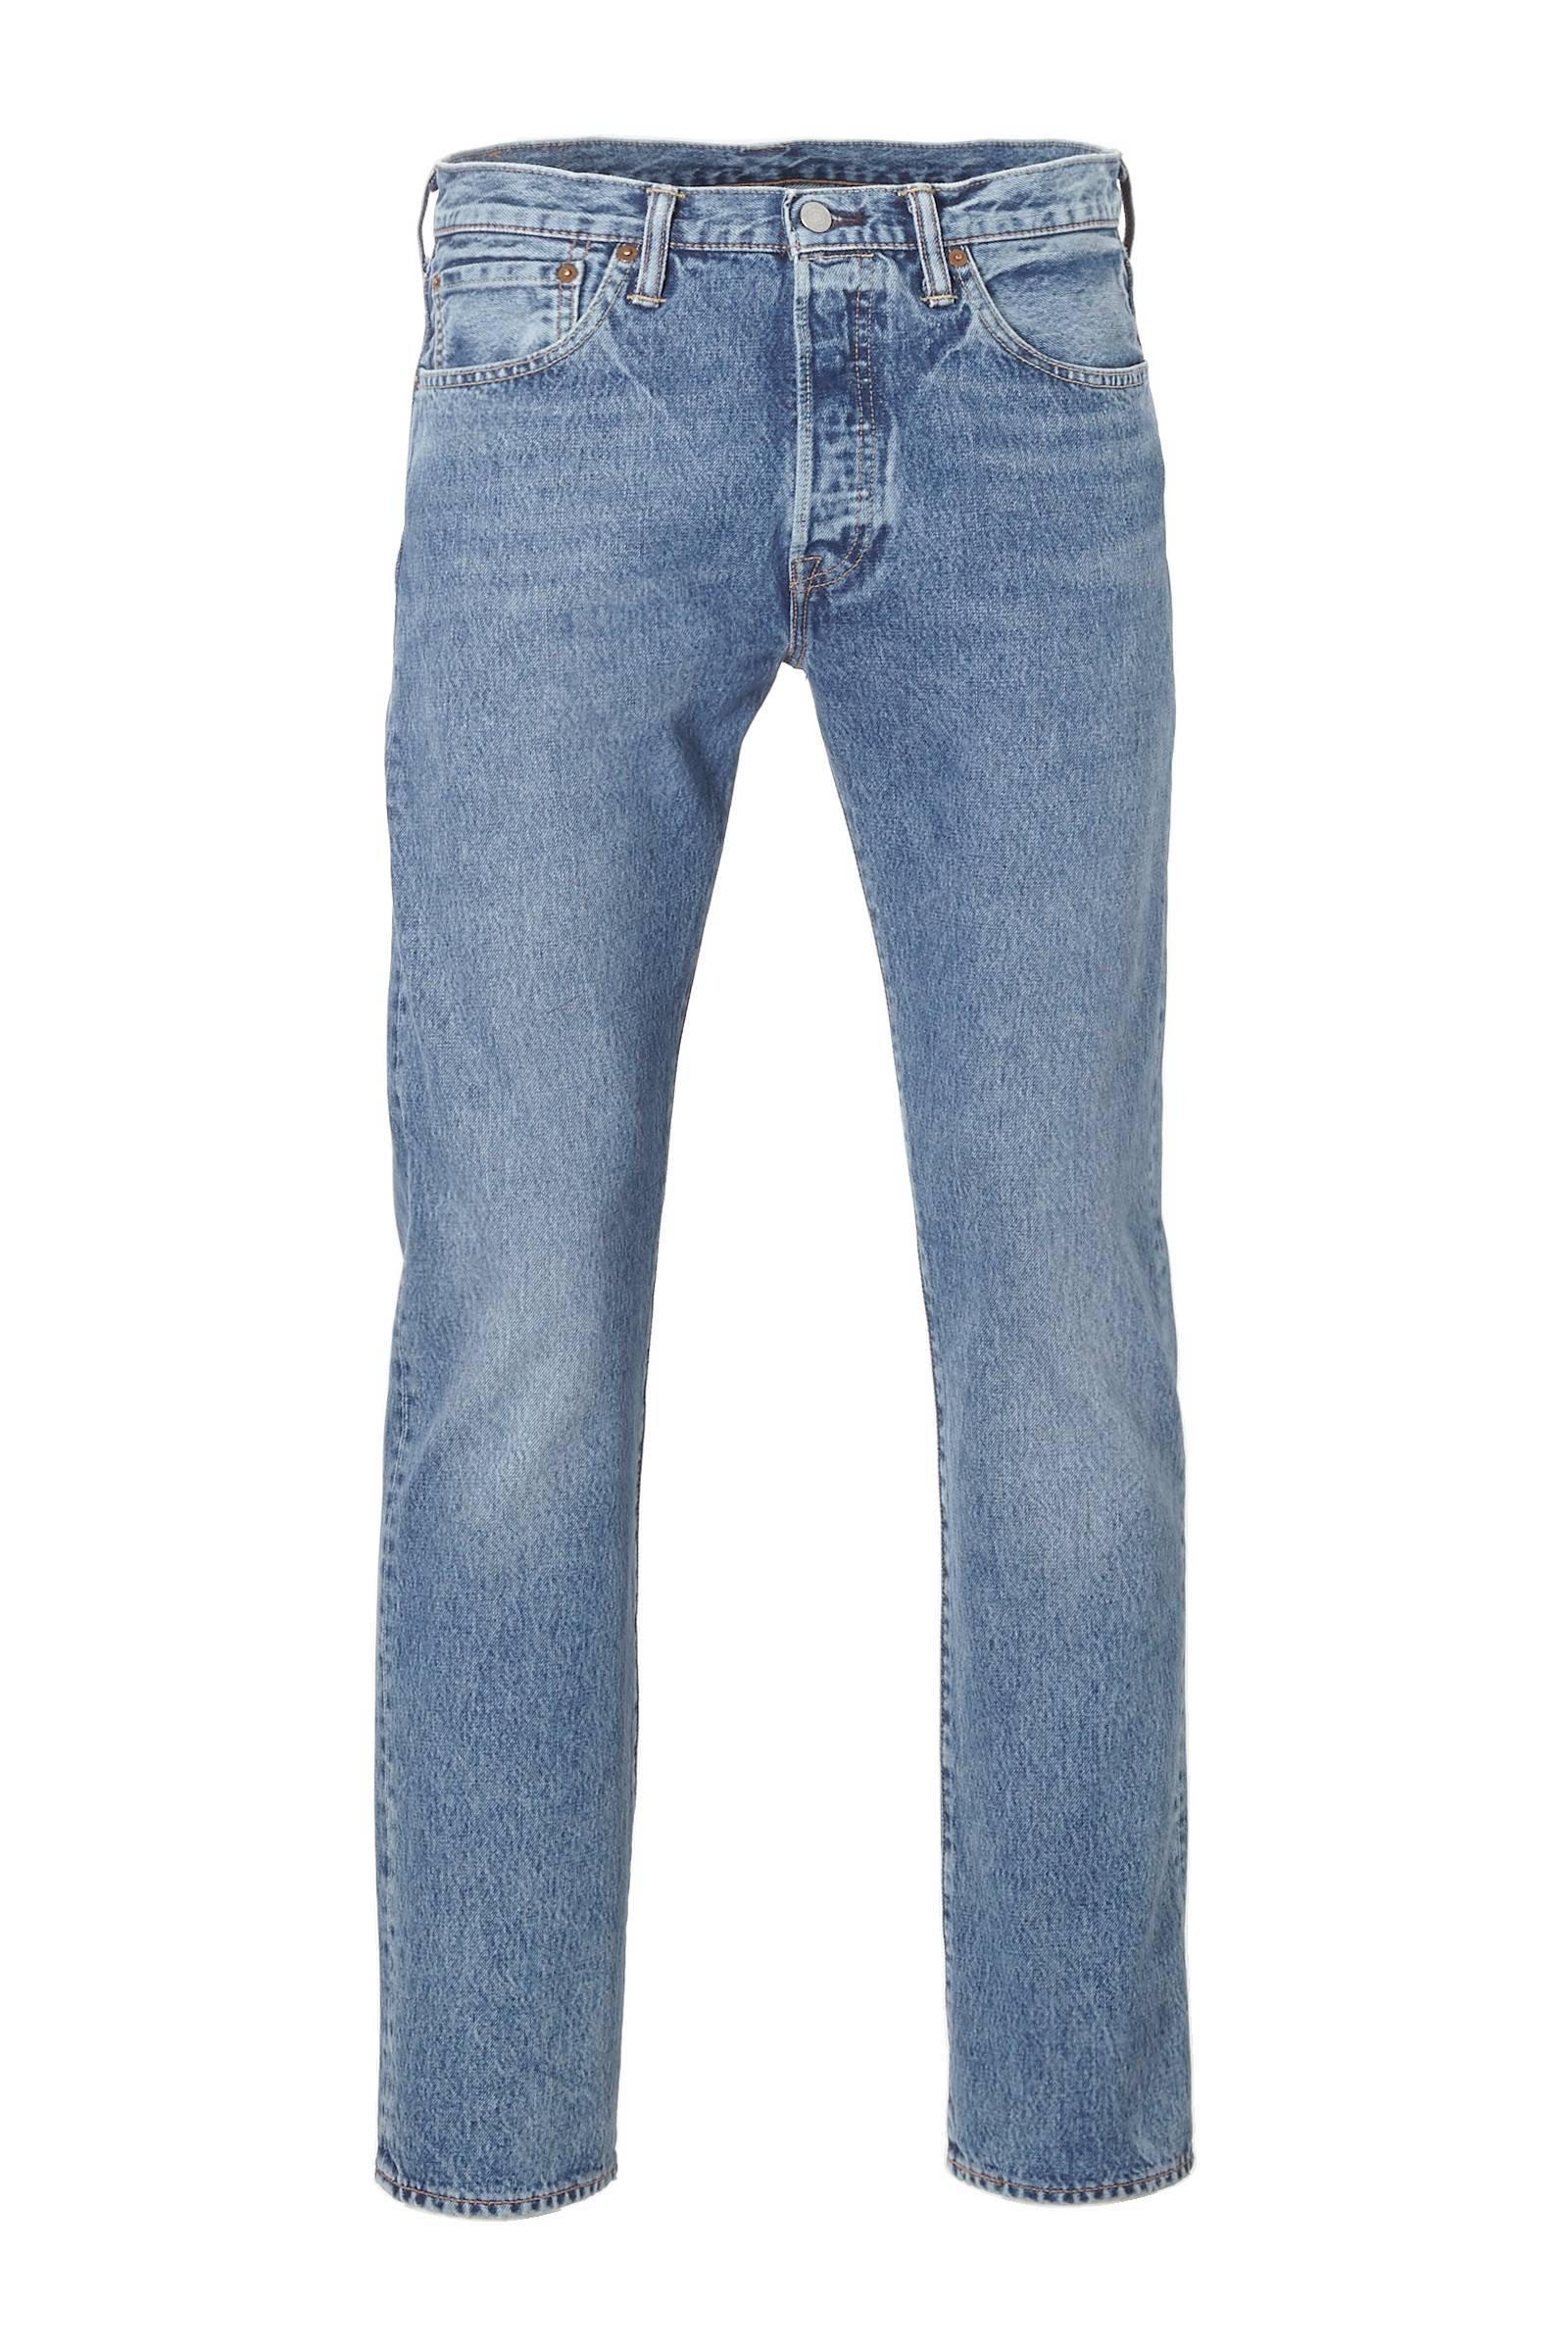 Levi's 501 original regular fit jeans (heren)